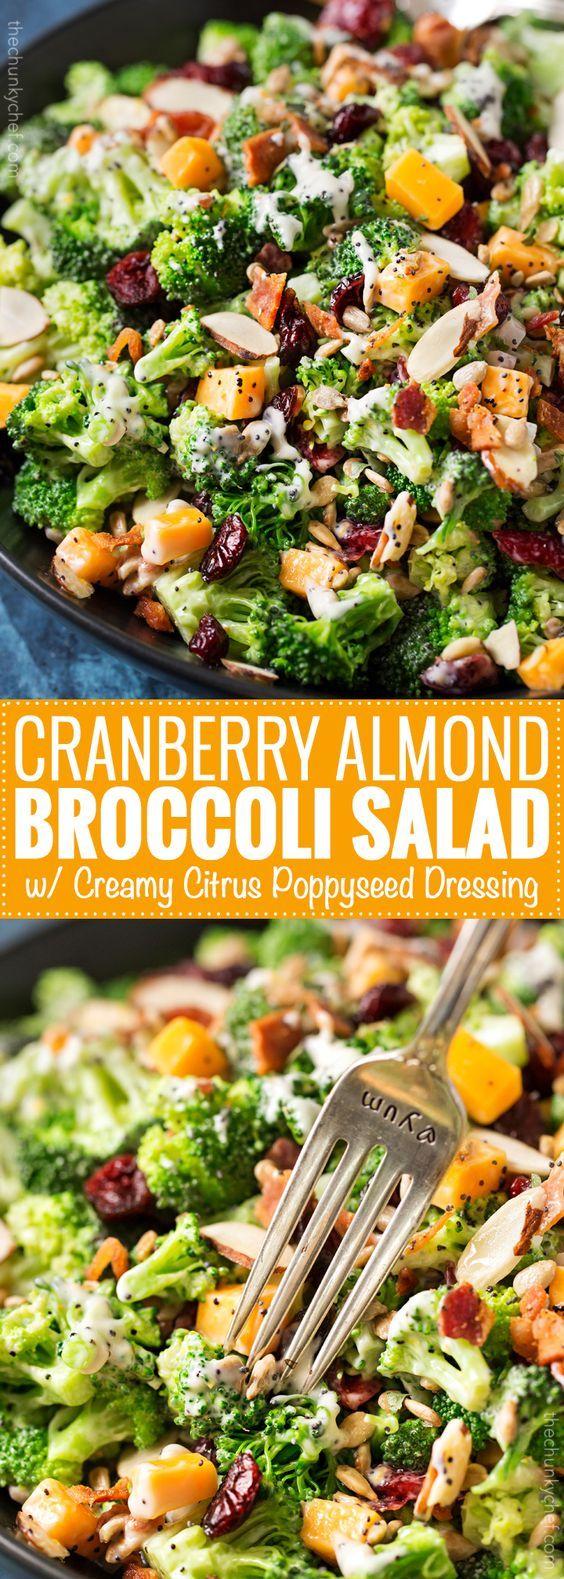 CRANBERRY ALMOND BROCCOLI SALAD RECIPE